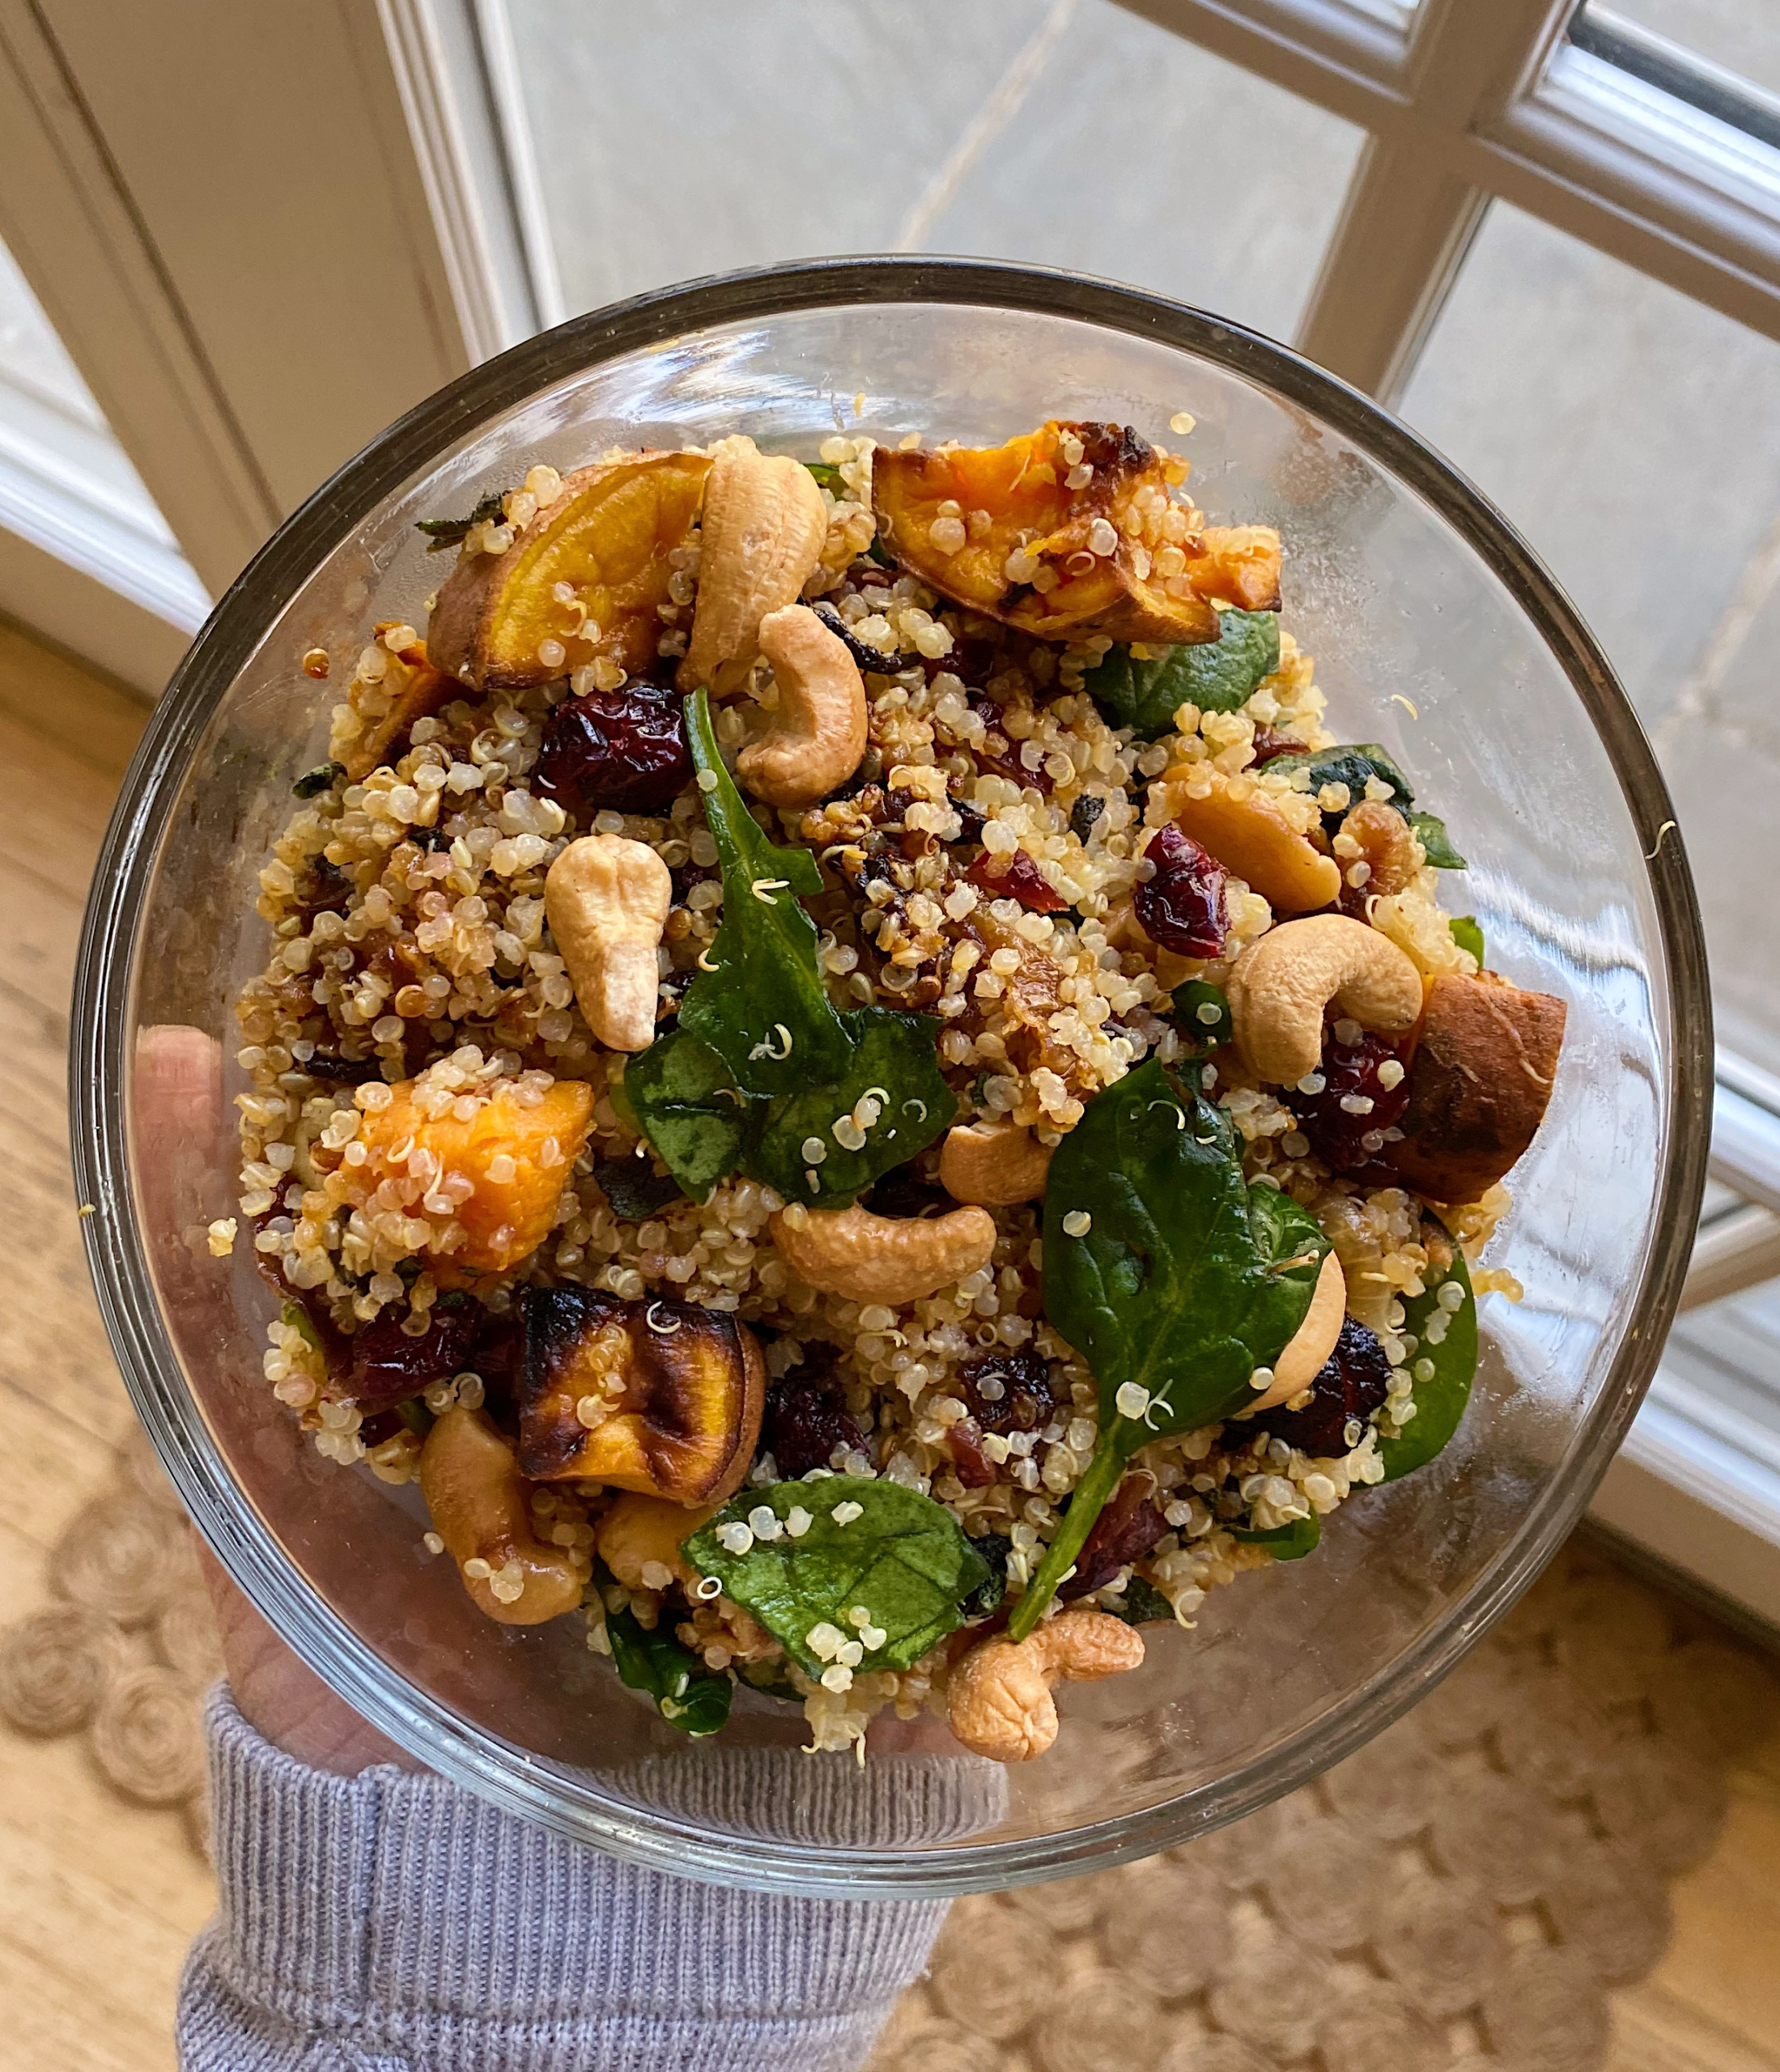 Quinoa Salad sweet potato caramelized onions gluten free squash warm #glutenfreerecipes www.healthygffamily.com